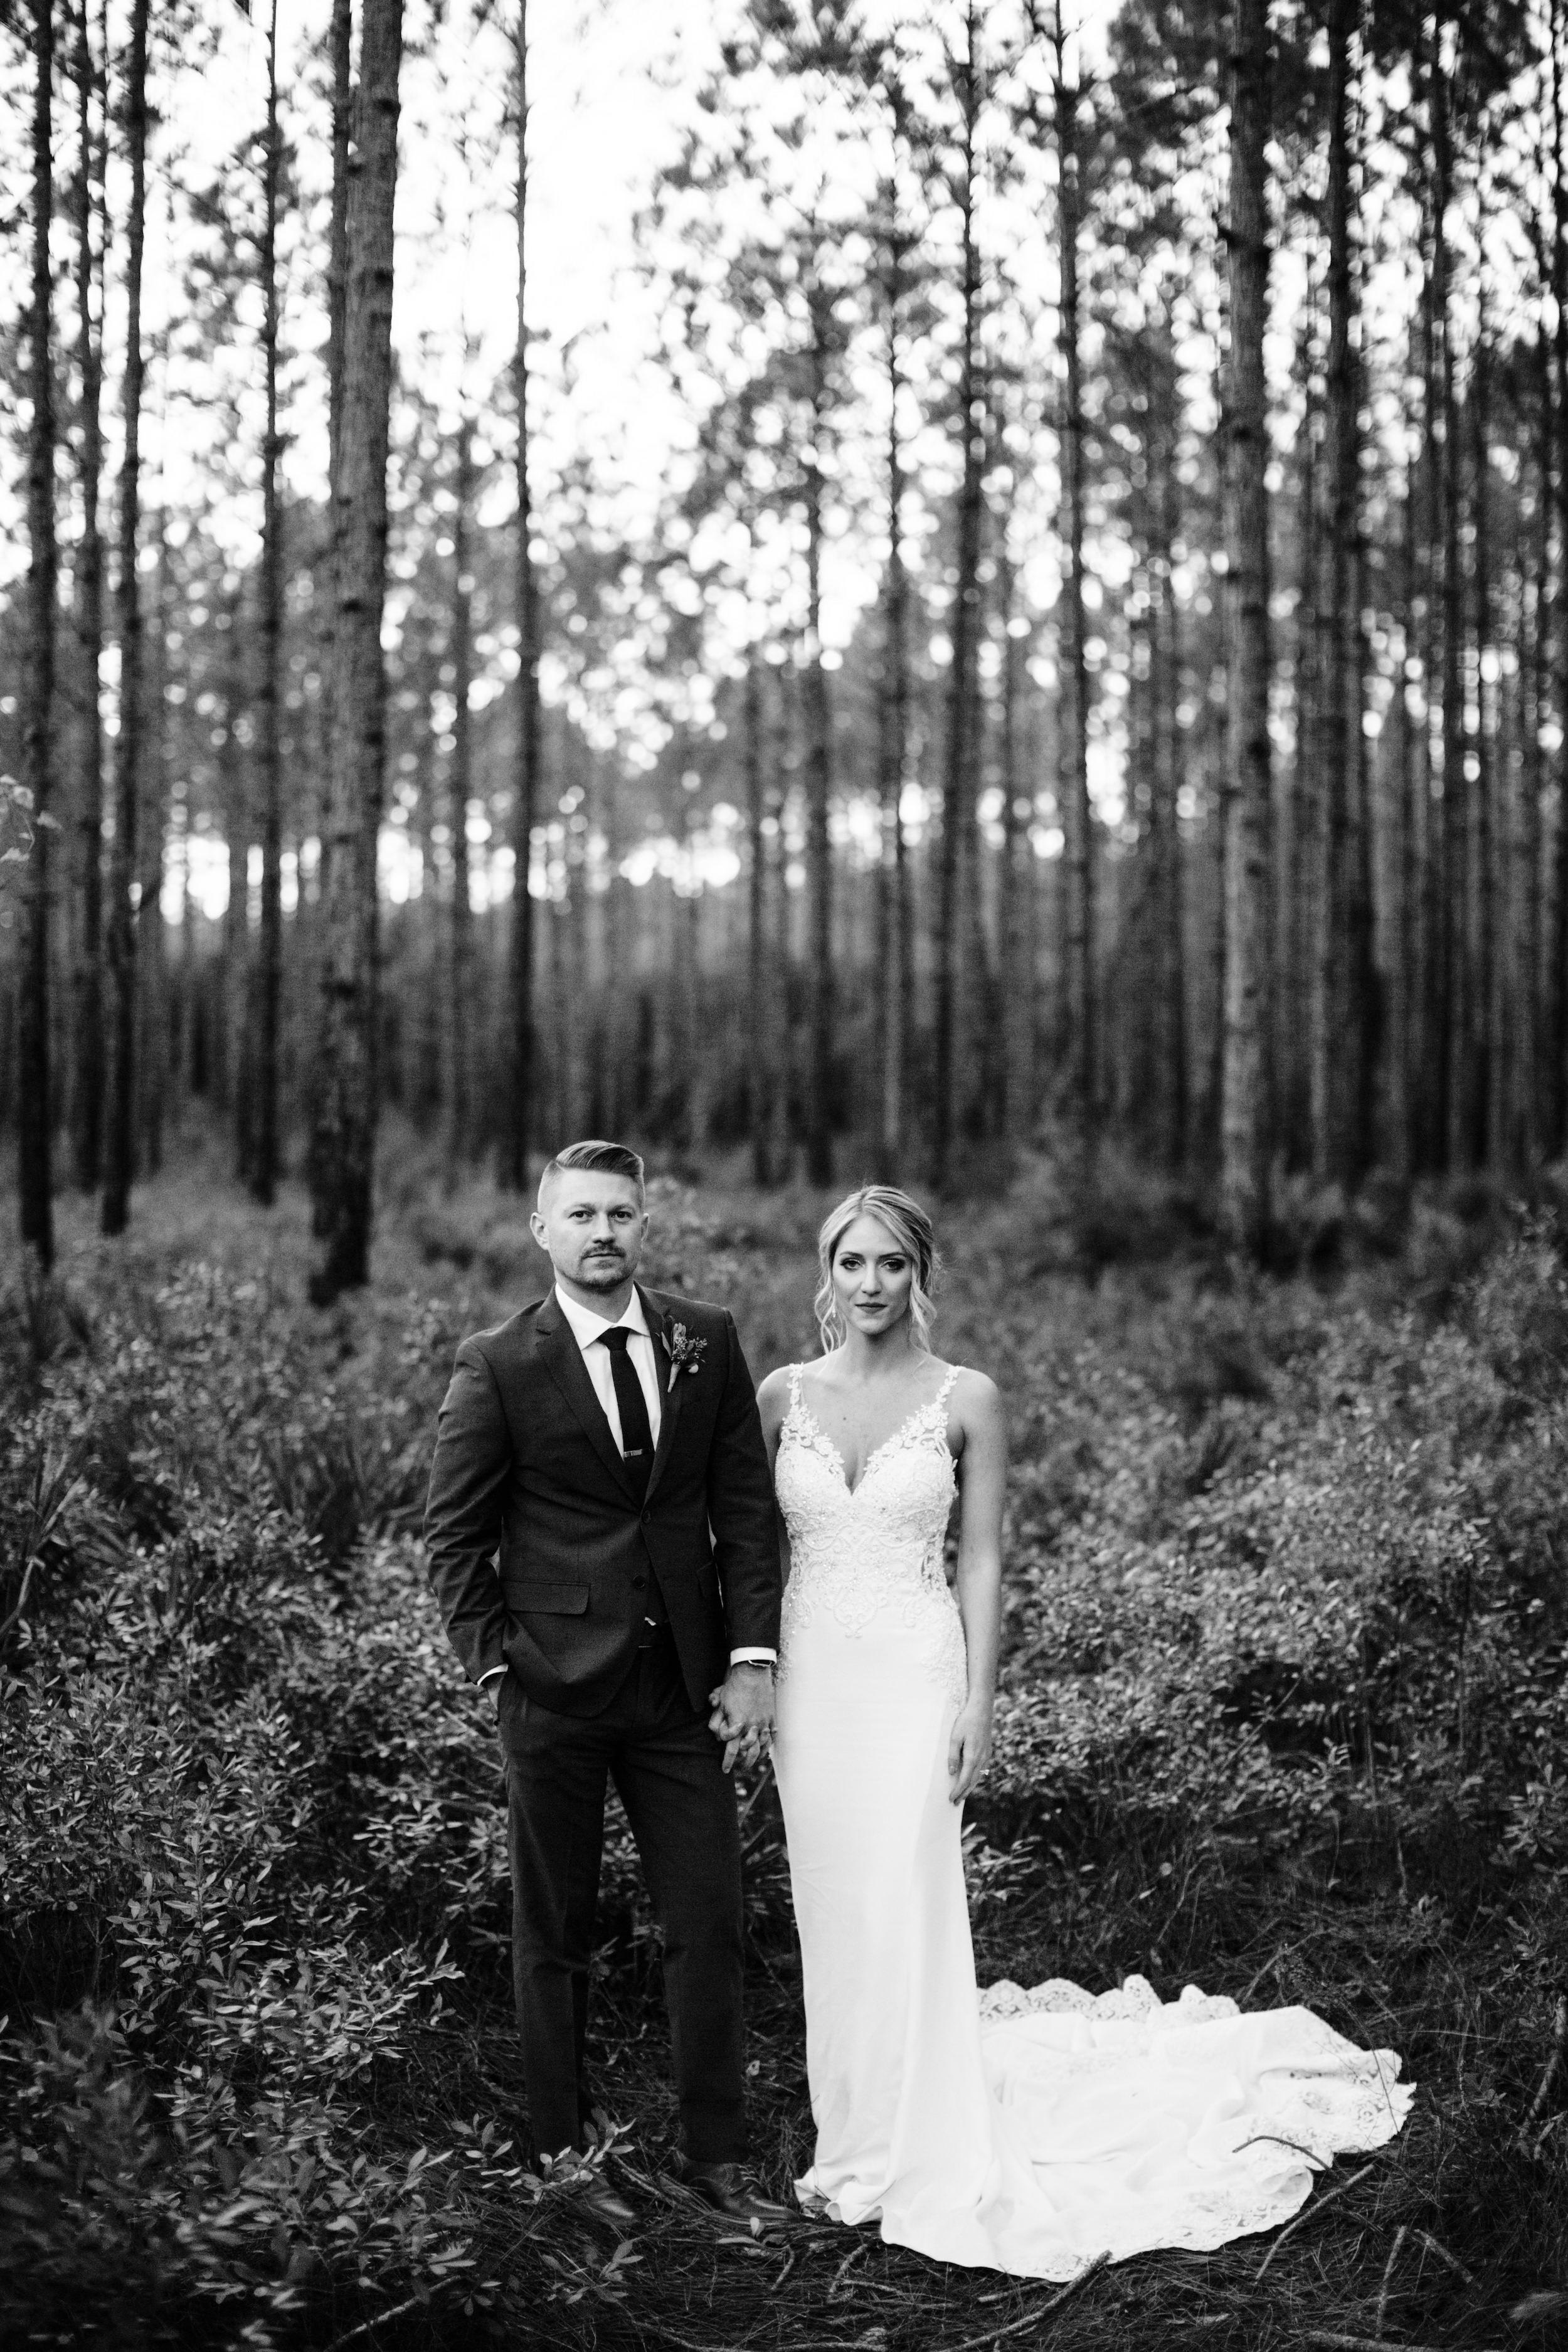 Ricky & Brittney - Portraits - Jake & Katie Photography_270.jpg